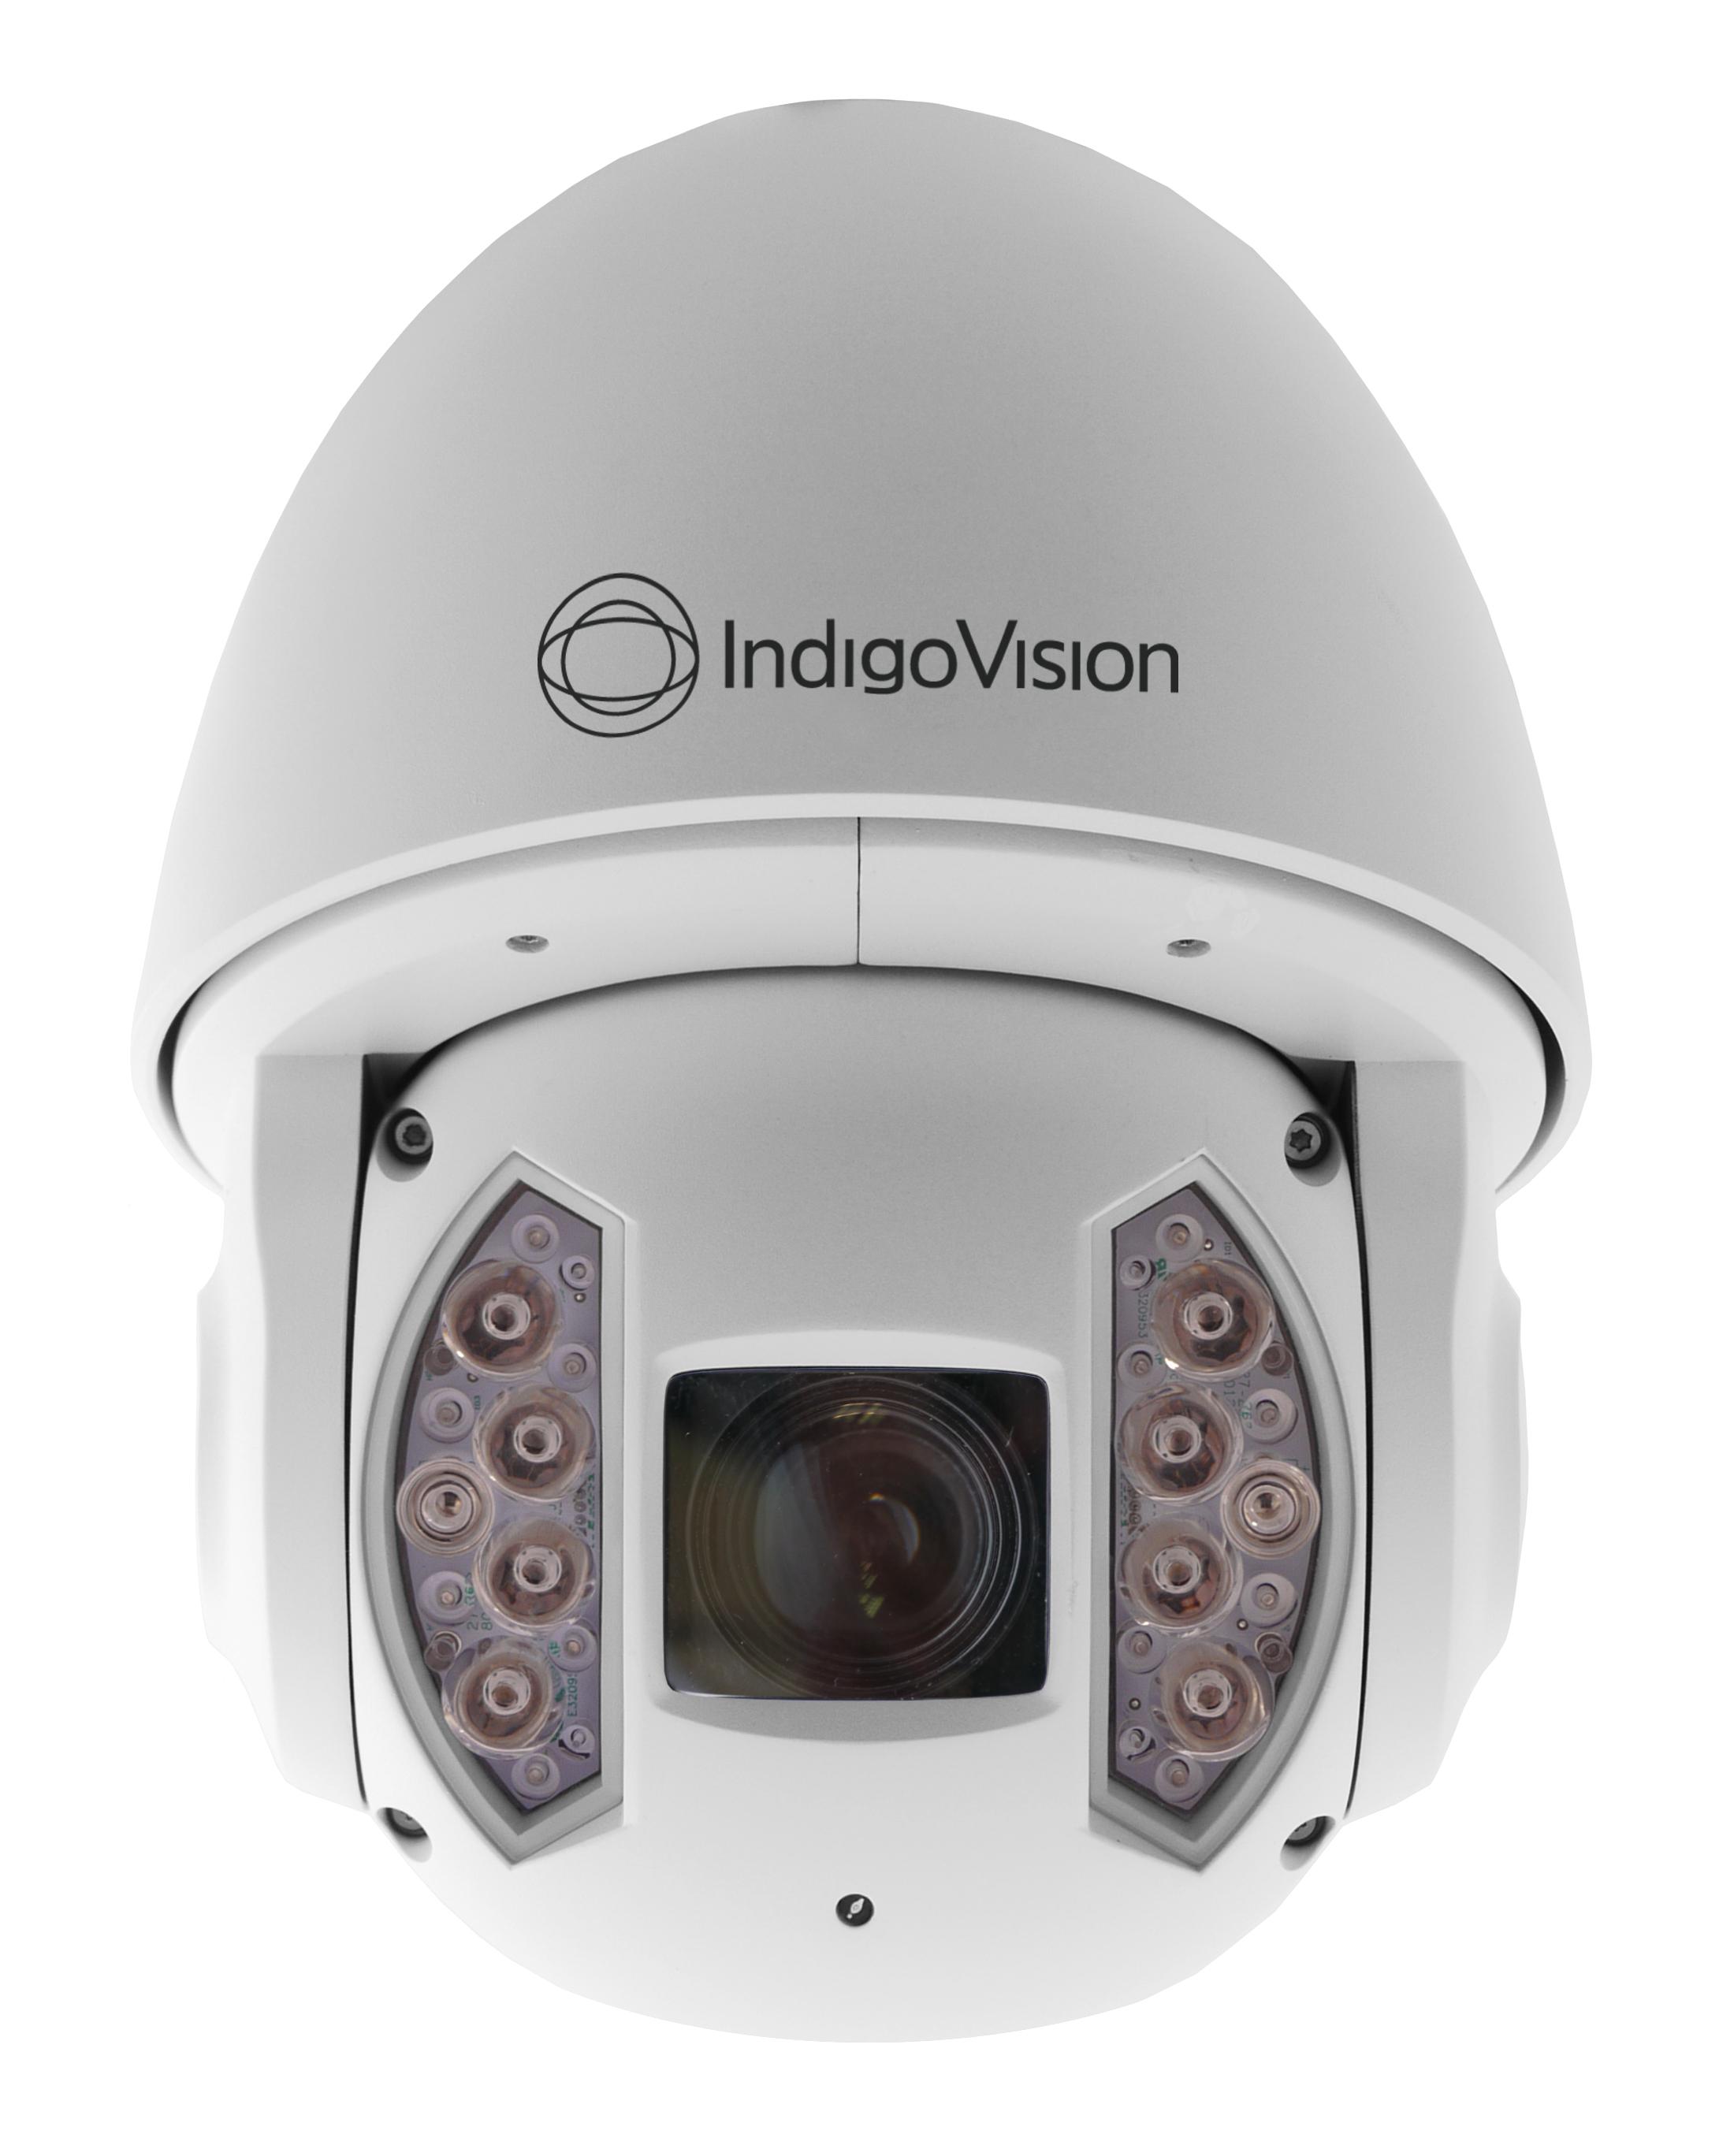 Az IndigoVision új adaptív IR gyorsdómja Forrás: IndigoVision